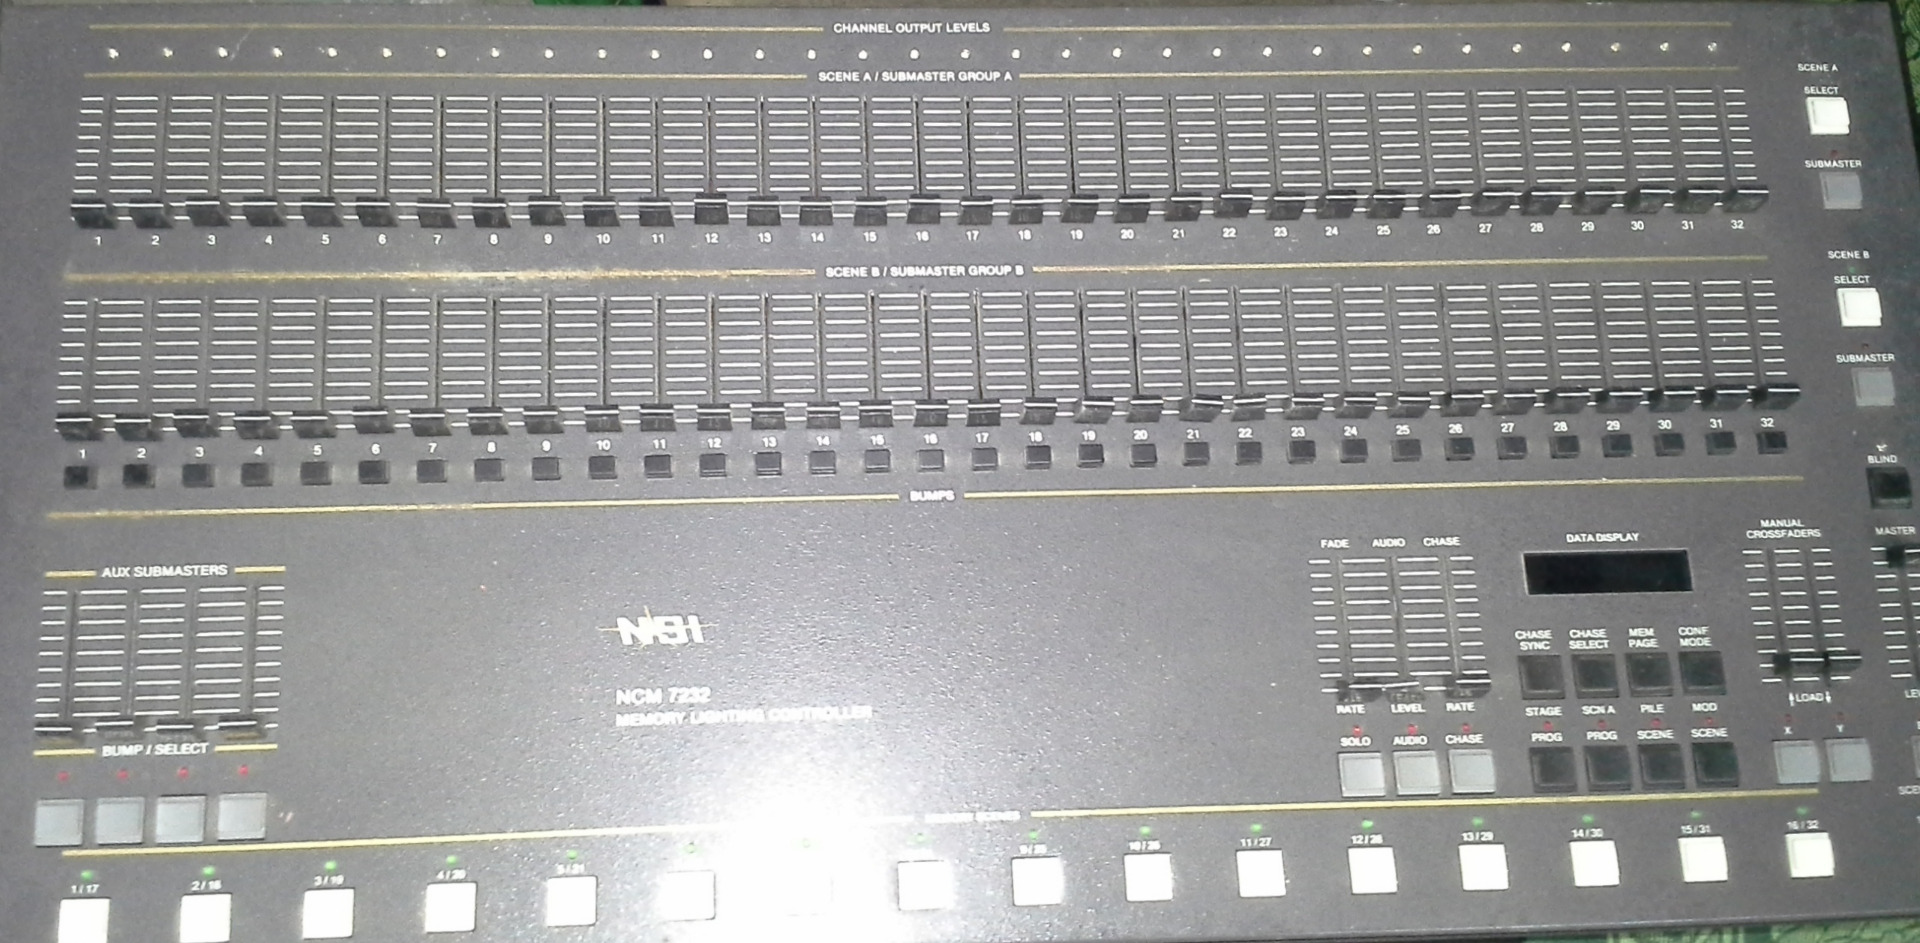 NSI NCM 7232